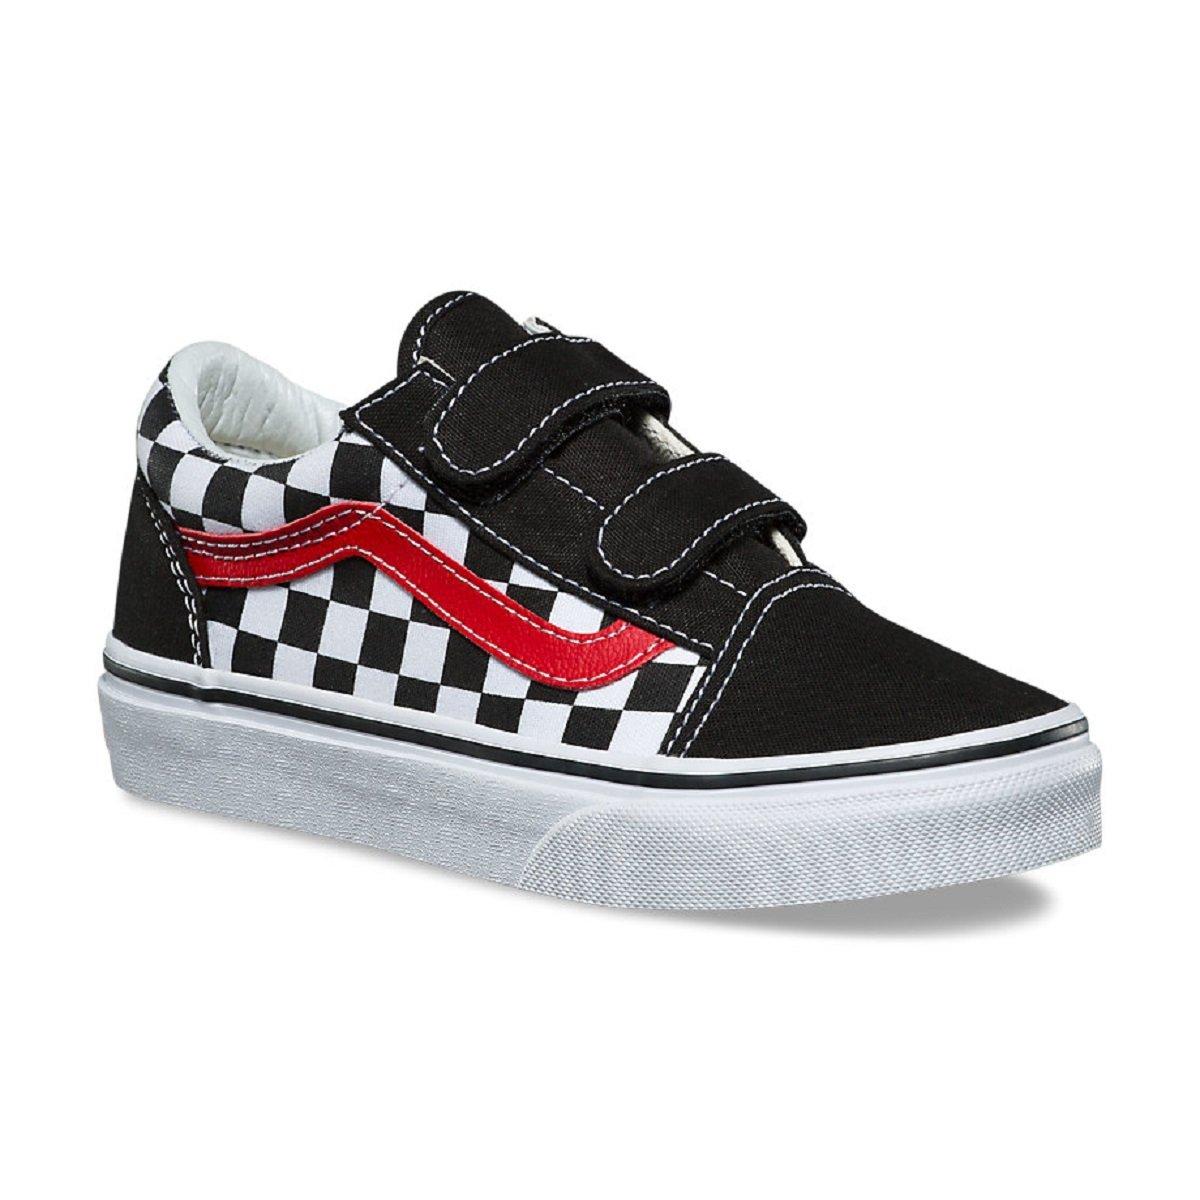 SPORTS SHOE BLACK VANS OLD SKOOL D3YBLK B078WWM6DT 10.5 M US Little Kid|(Checkerboard) Black/ Red (Checkerboard) Black/ Red 10.5 M US Little Kid, 岐阜県池田町 93c15804